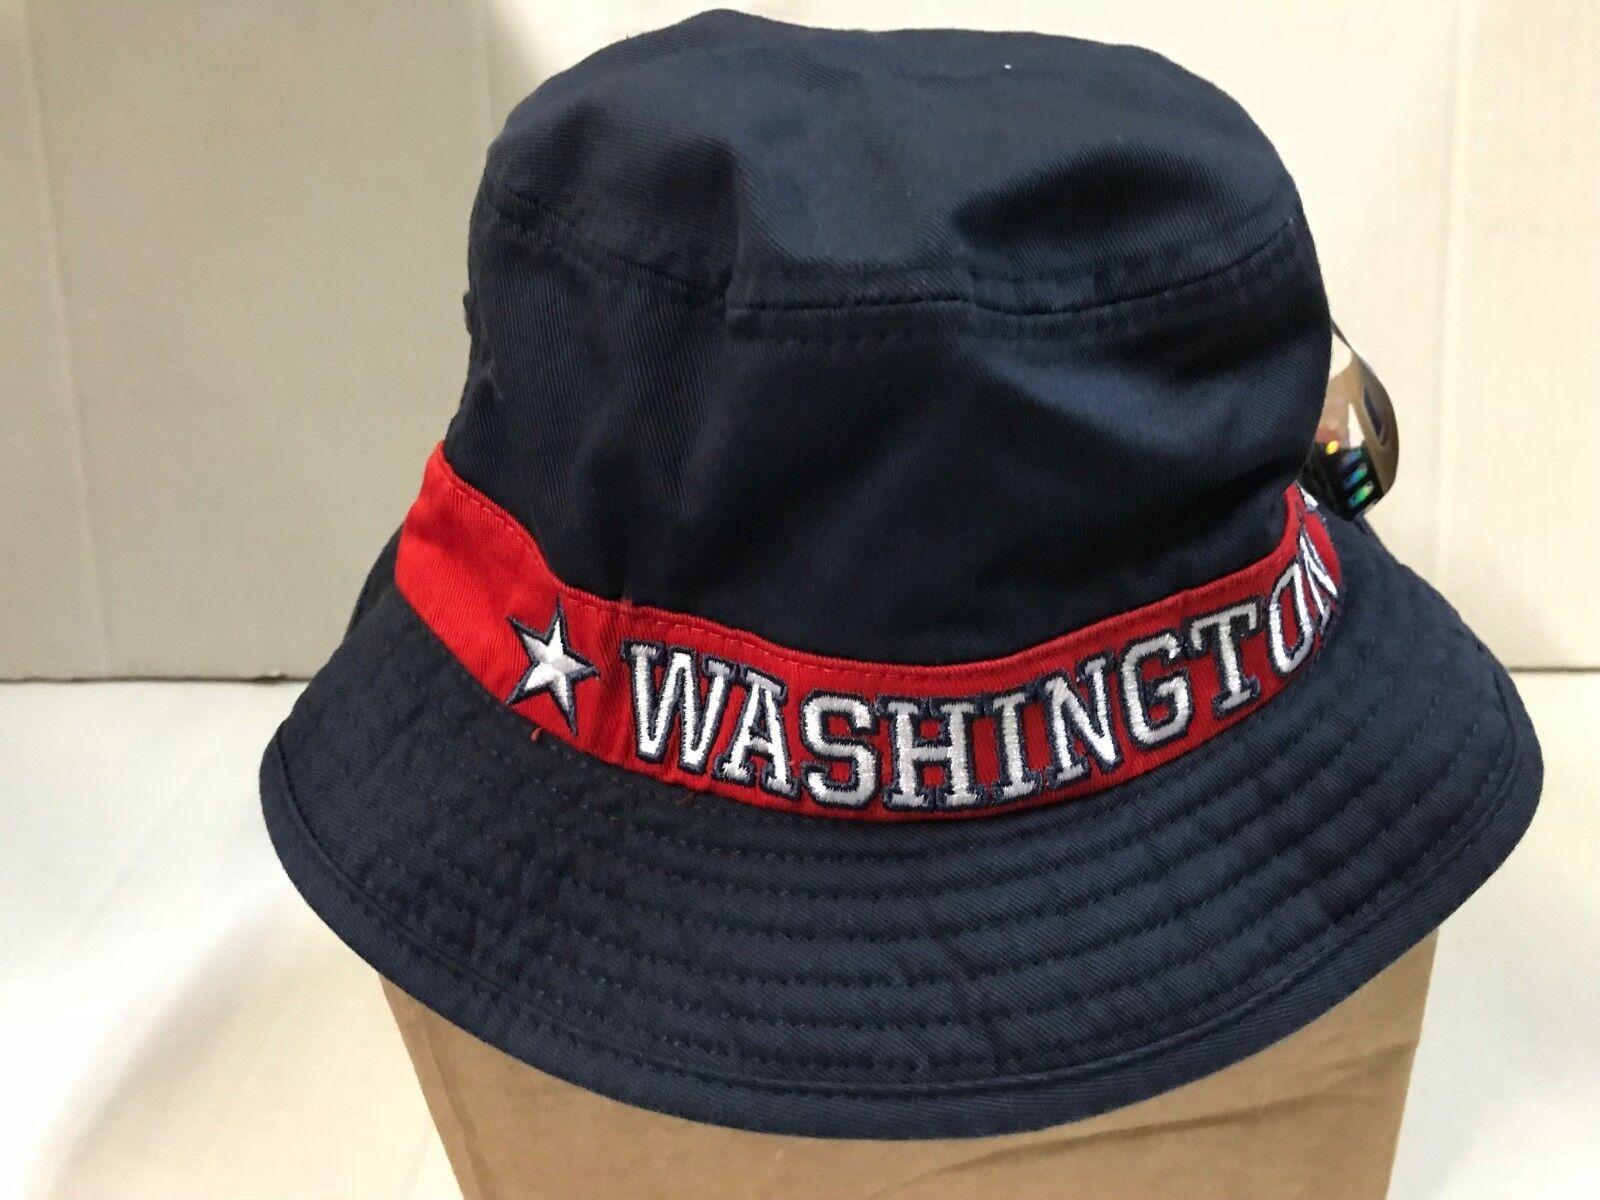 NBA WASHINGTON WIZARDS ADIDAS MEN'S  BLACK/RED BUCKET HAT SI